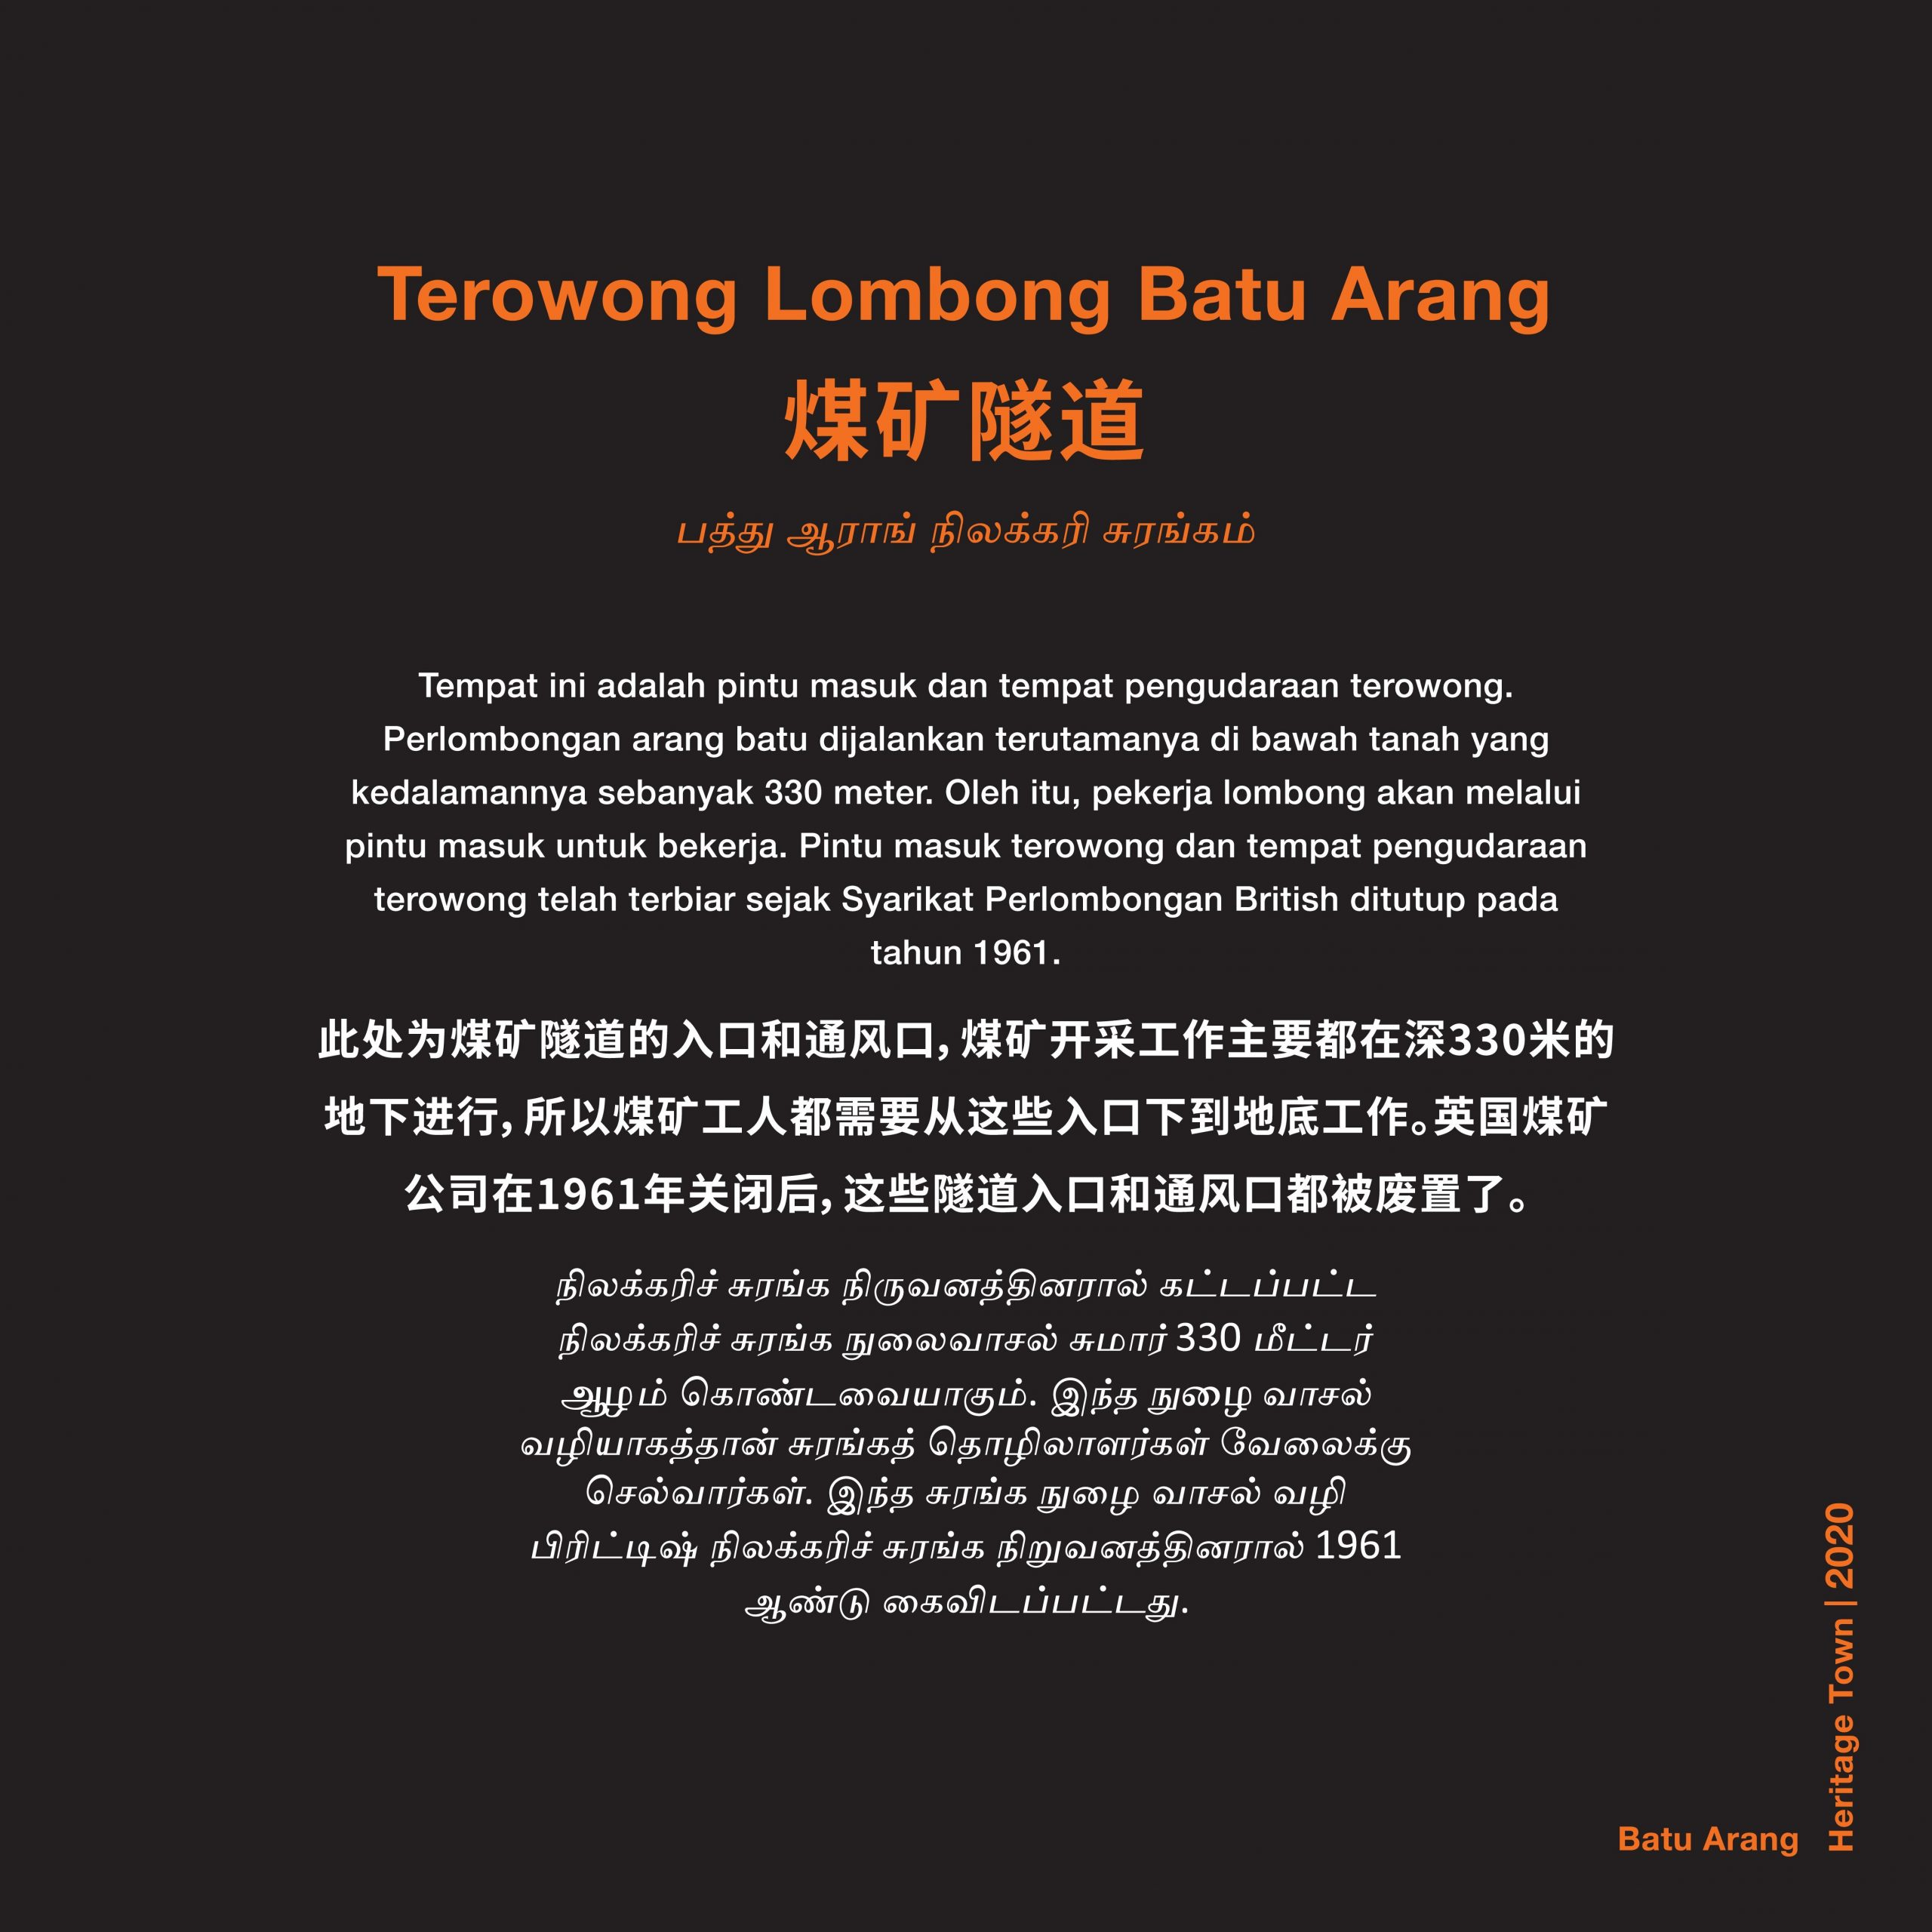 BatuArang-BuildingIntroduction-FAOL-04_00001